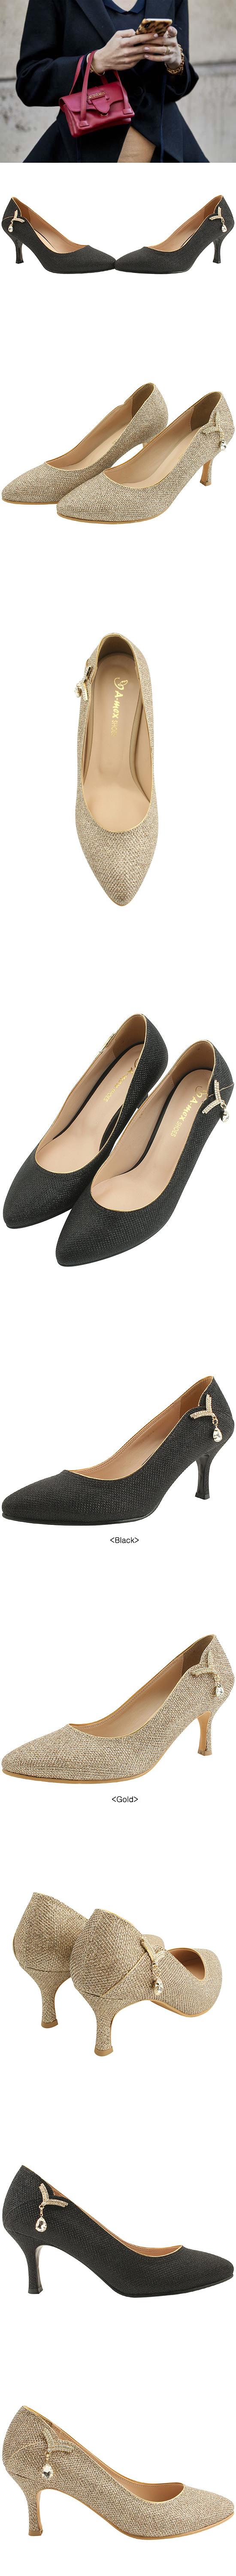 Cubic Brooch Pearl Stiletto High Heels Black